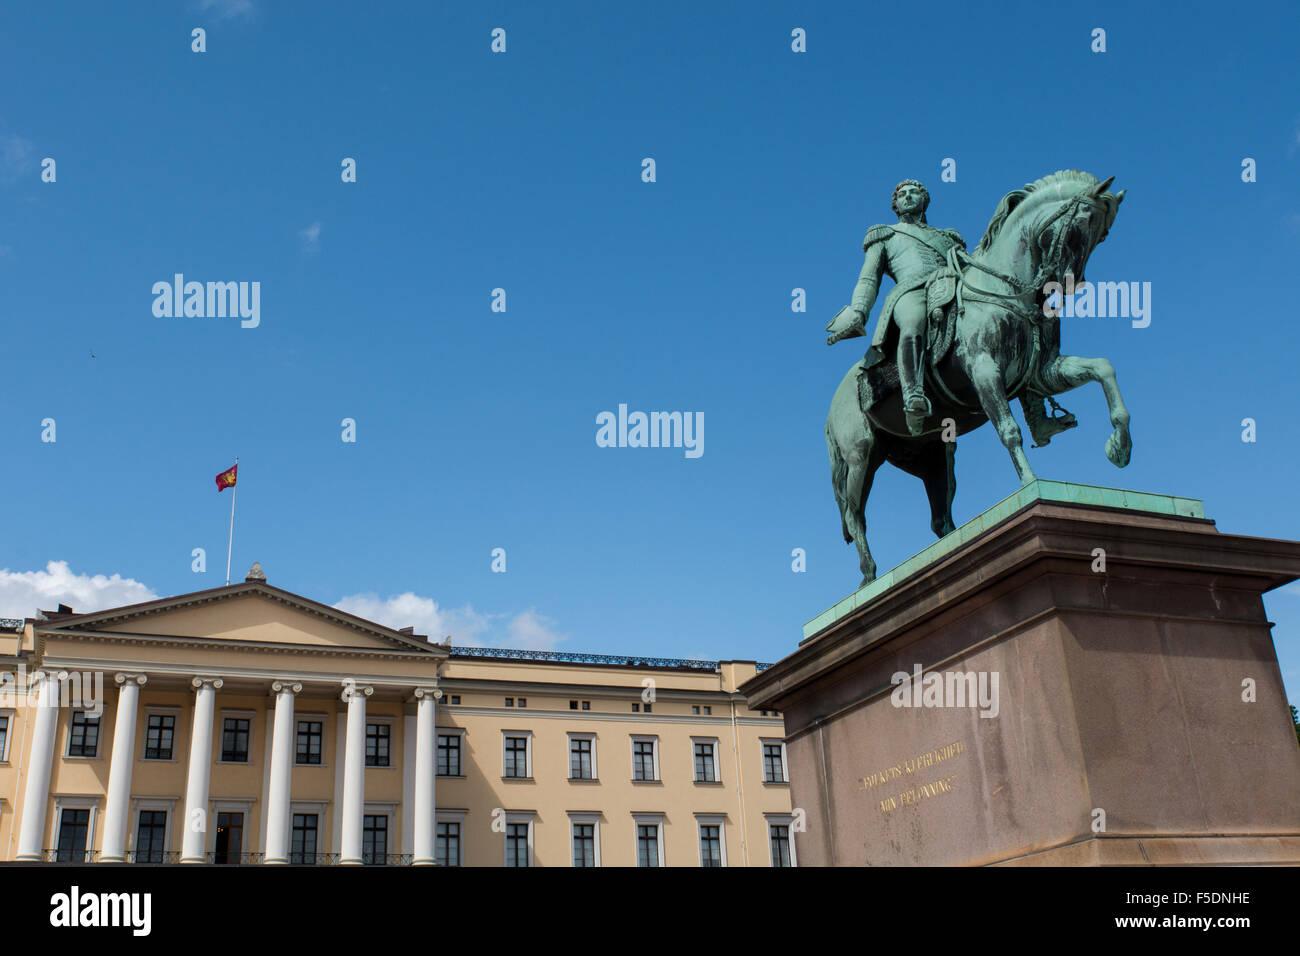 Norway, Oslo, Royal Palace (Det Kongelige Slott), 173 room Royal residence, circa 1824-1848. Equestrian statue of Stock Photo